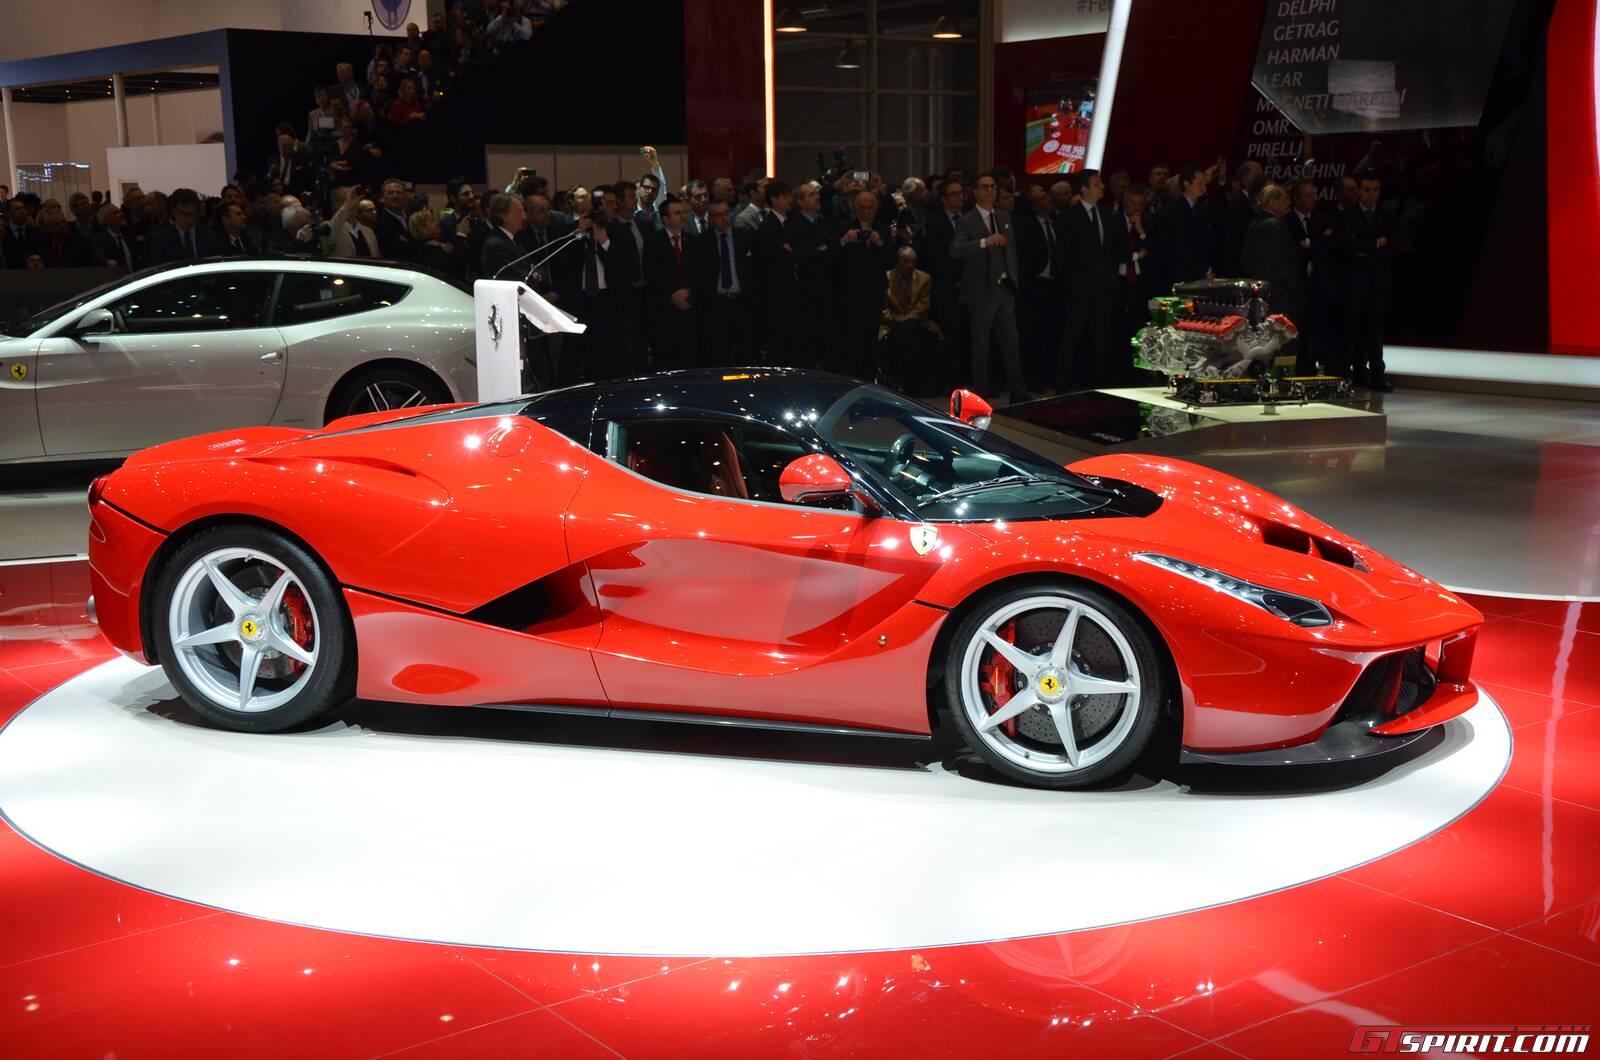 Laferrari Top View >> Ferrari LaFerrari (Enzo Replacement) - MyG37